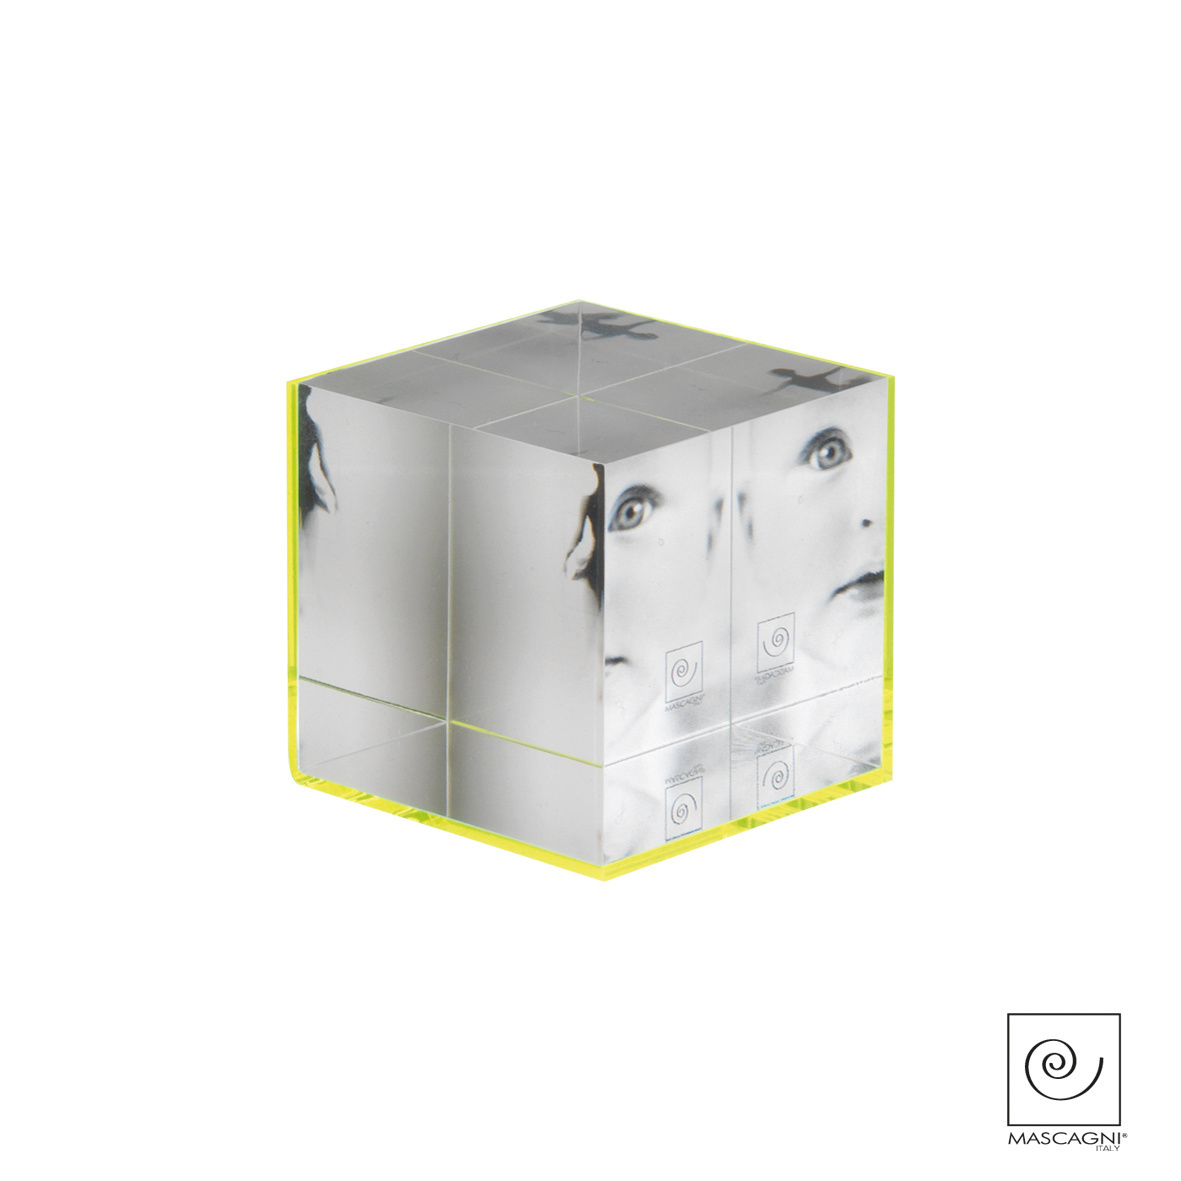 Art Mascagni A850 CUBE - COL.GREEN